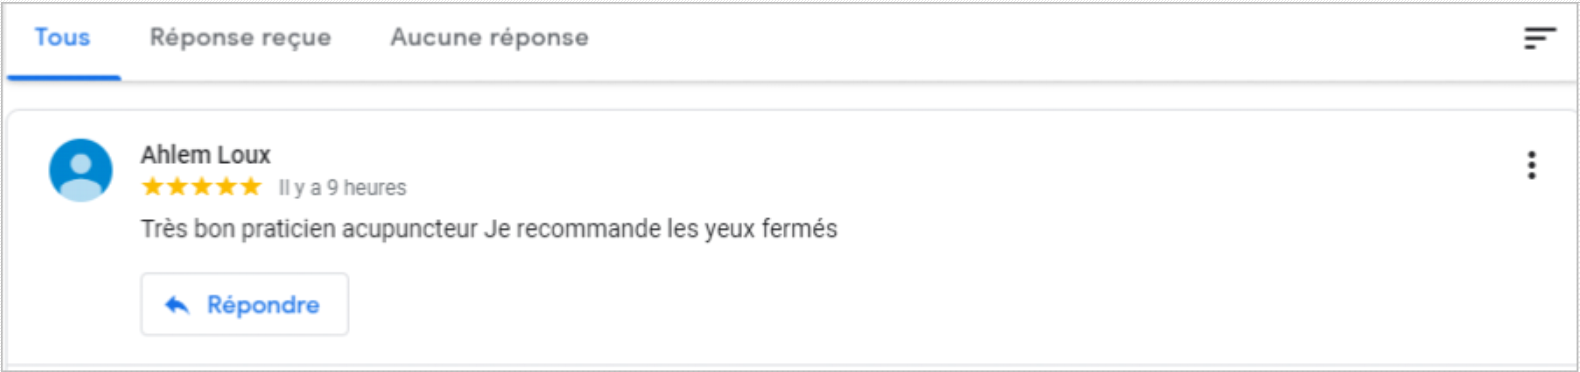 Témoignage Mme Loux